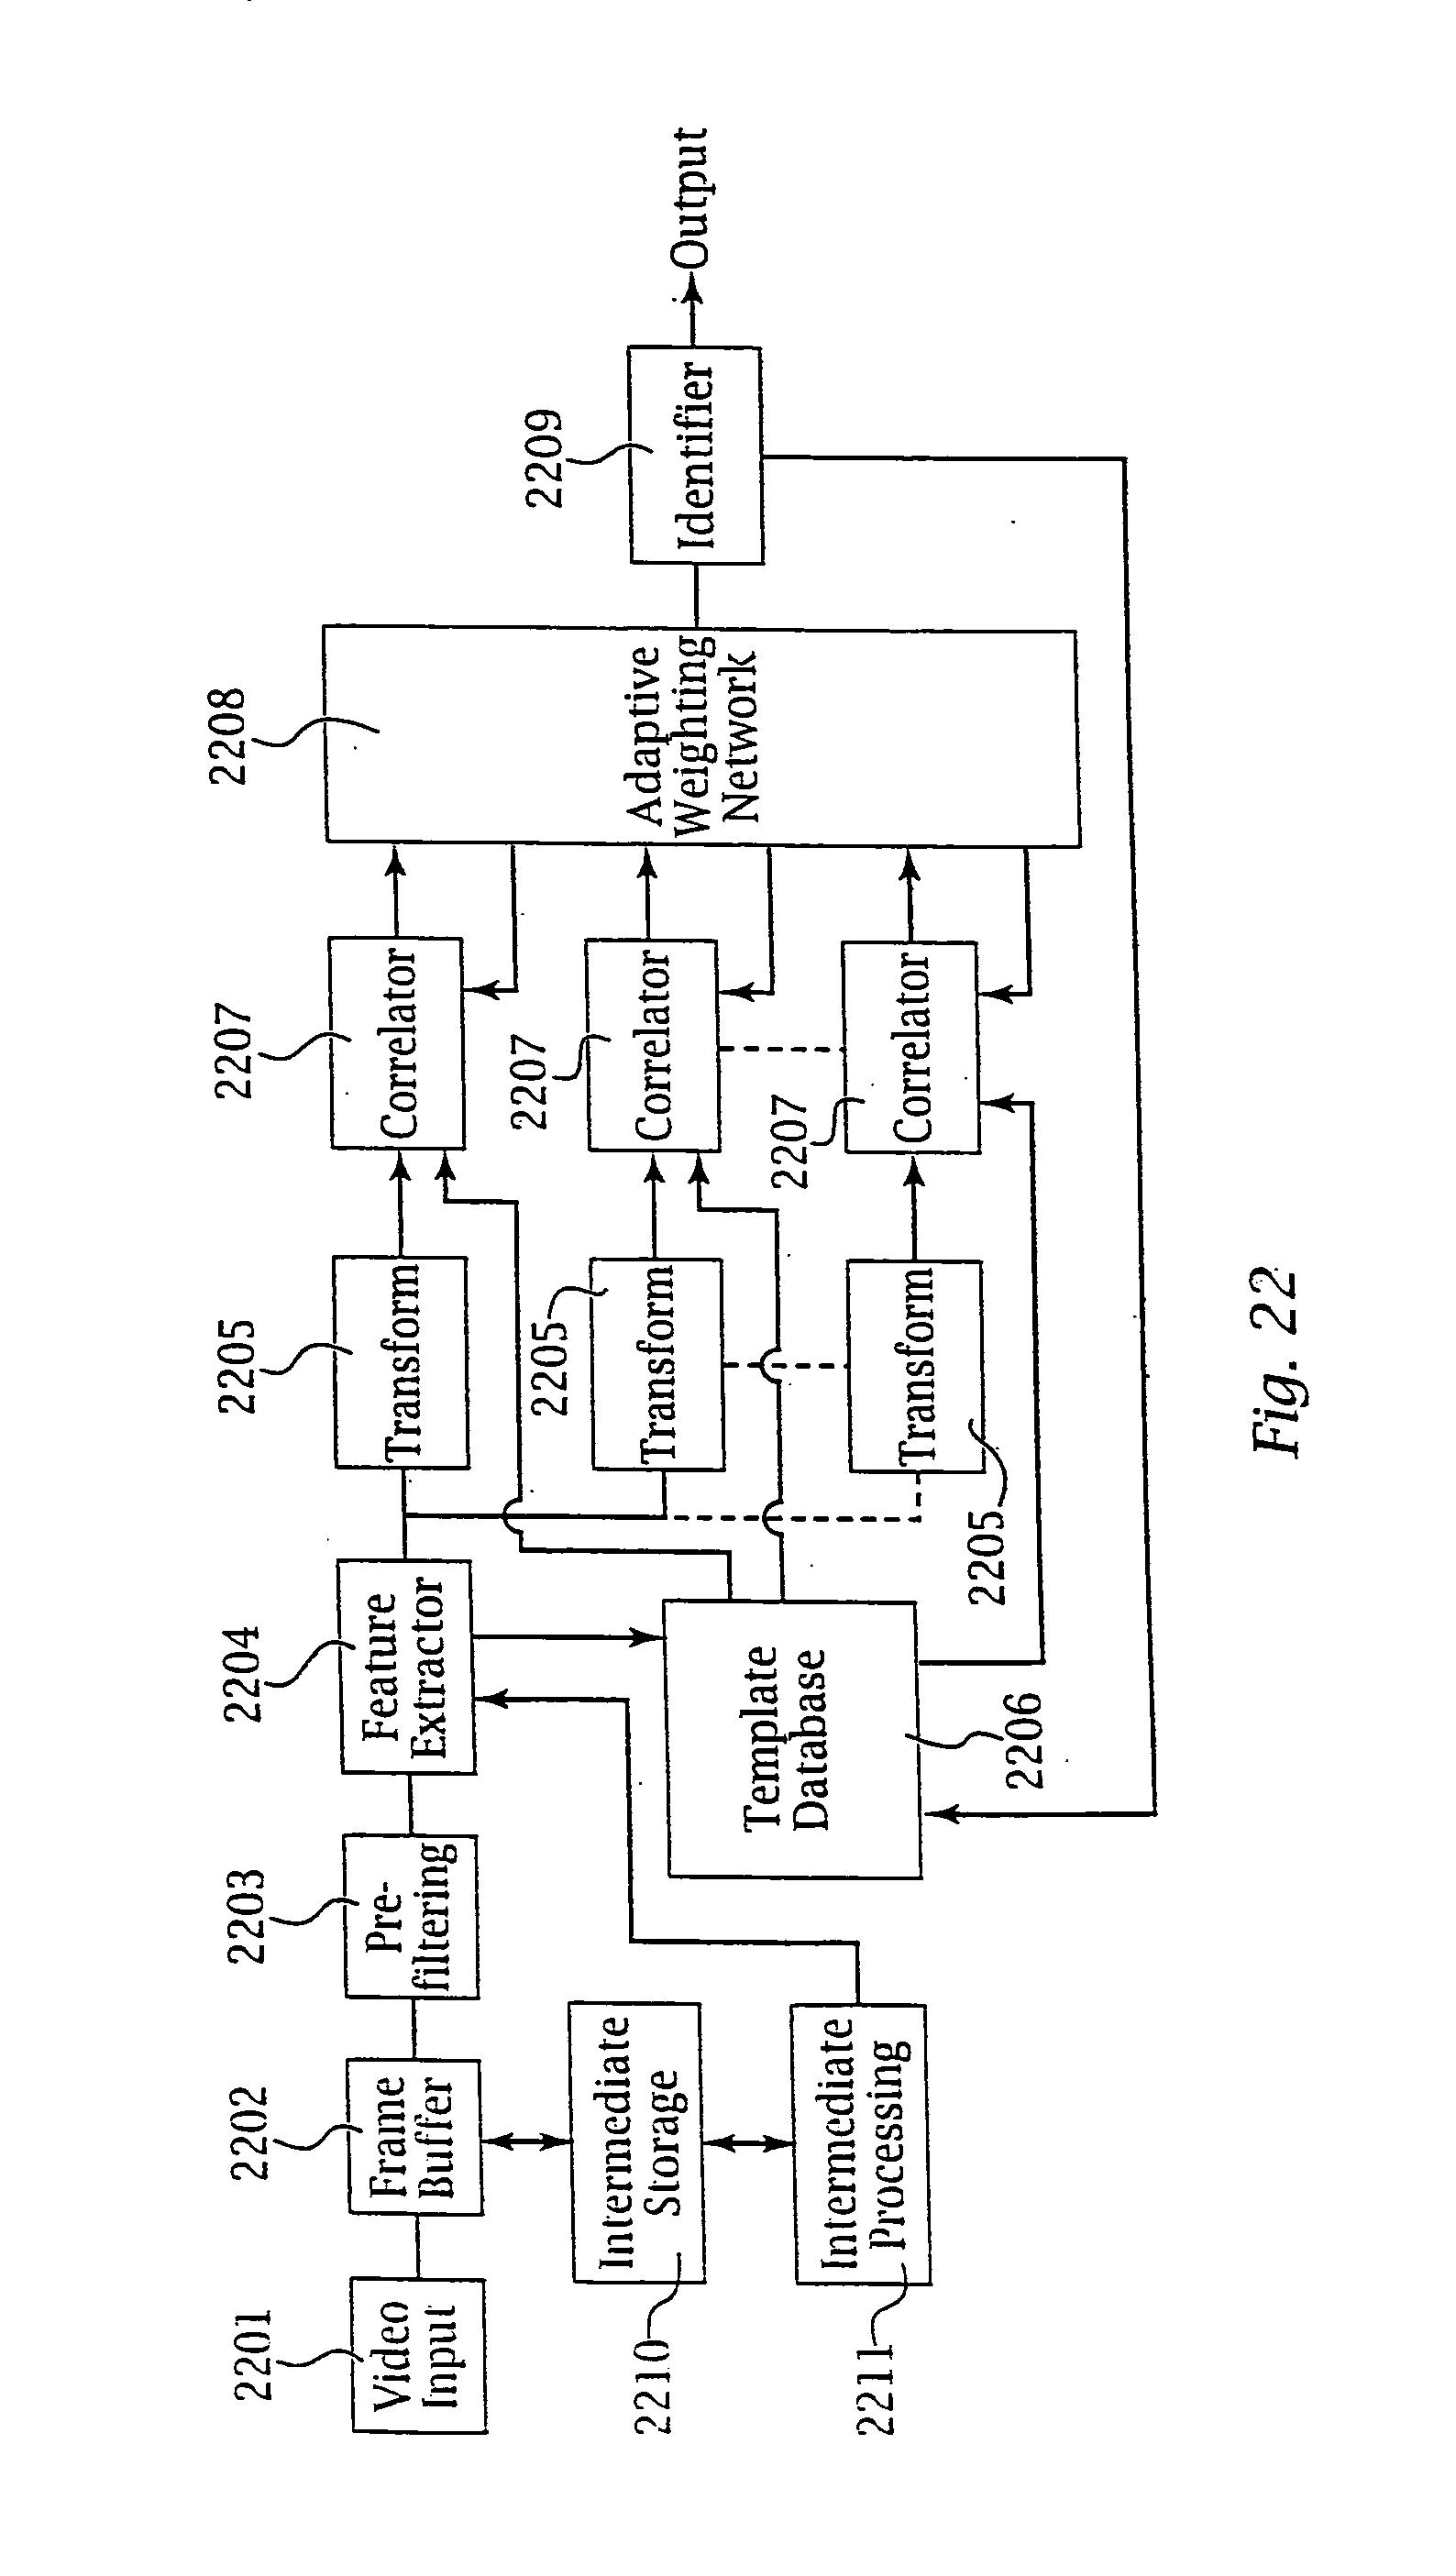 Patent Us20060200258 Vehicular Information System And Method Minimumcomponent Phono Amp Circuit Diagram Tradeoficcom Drawing